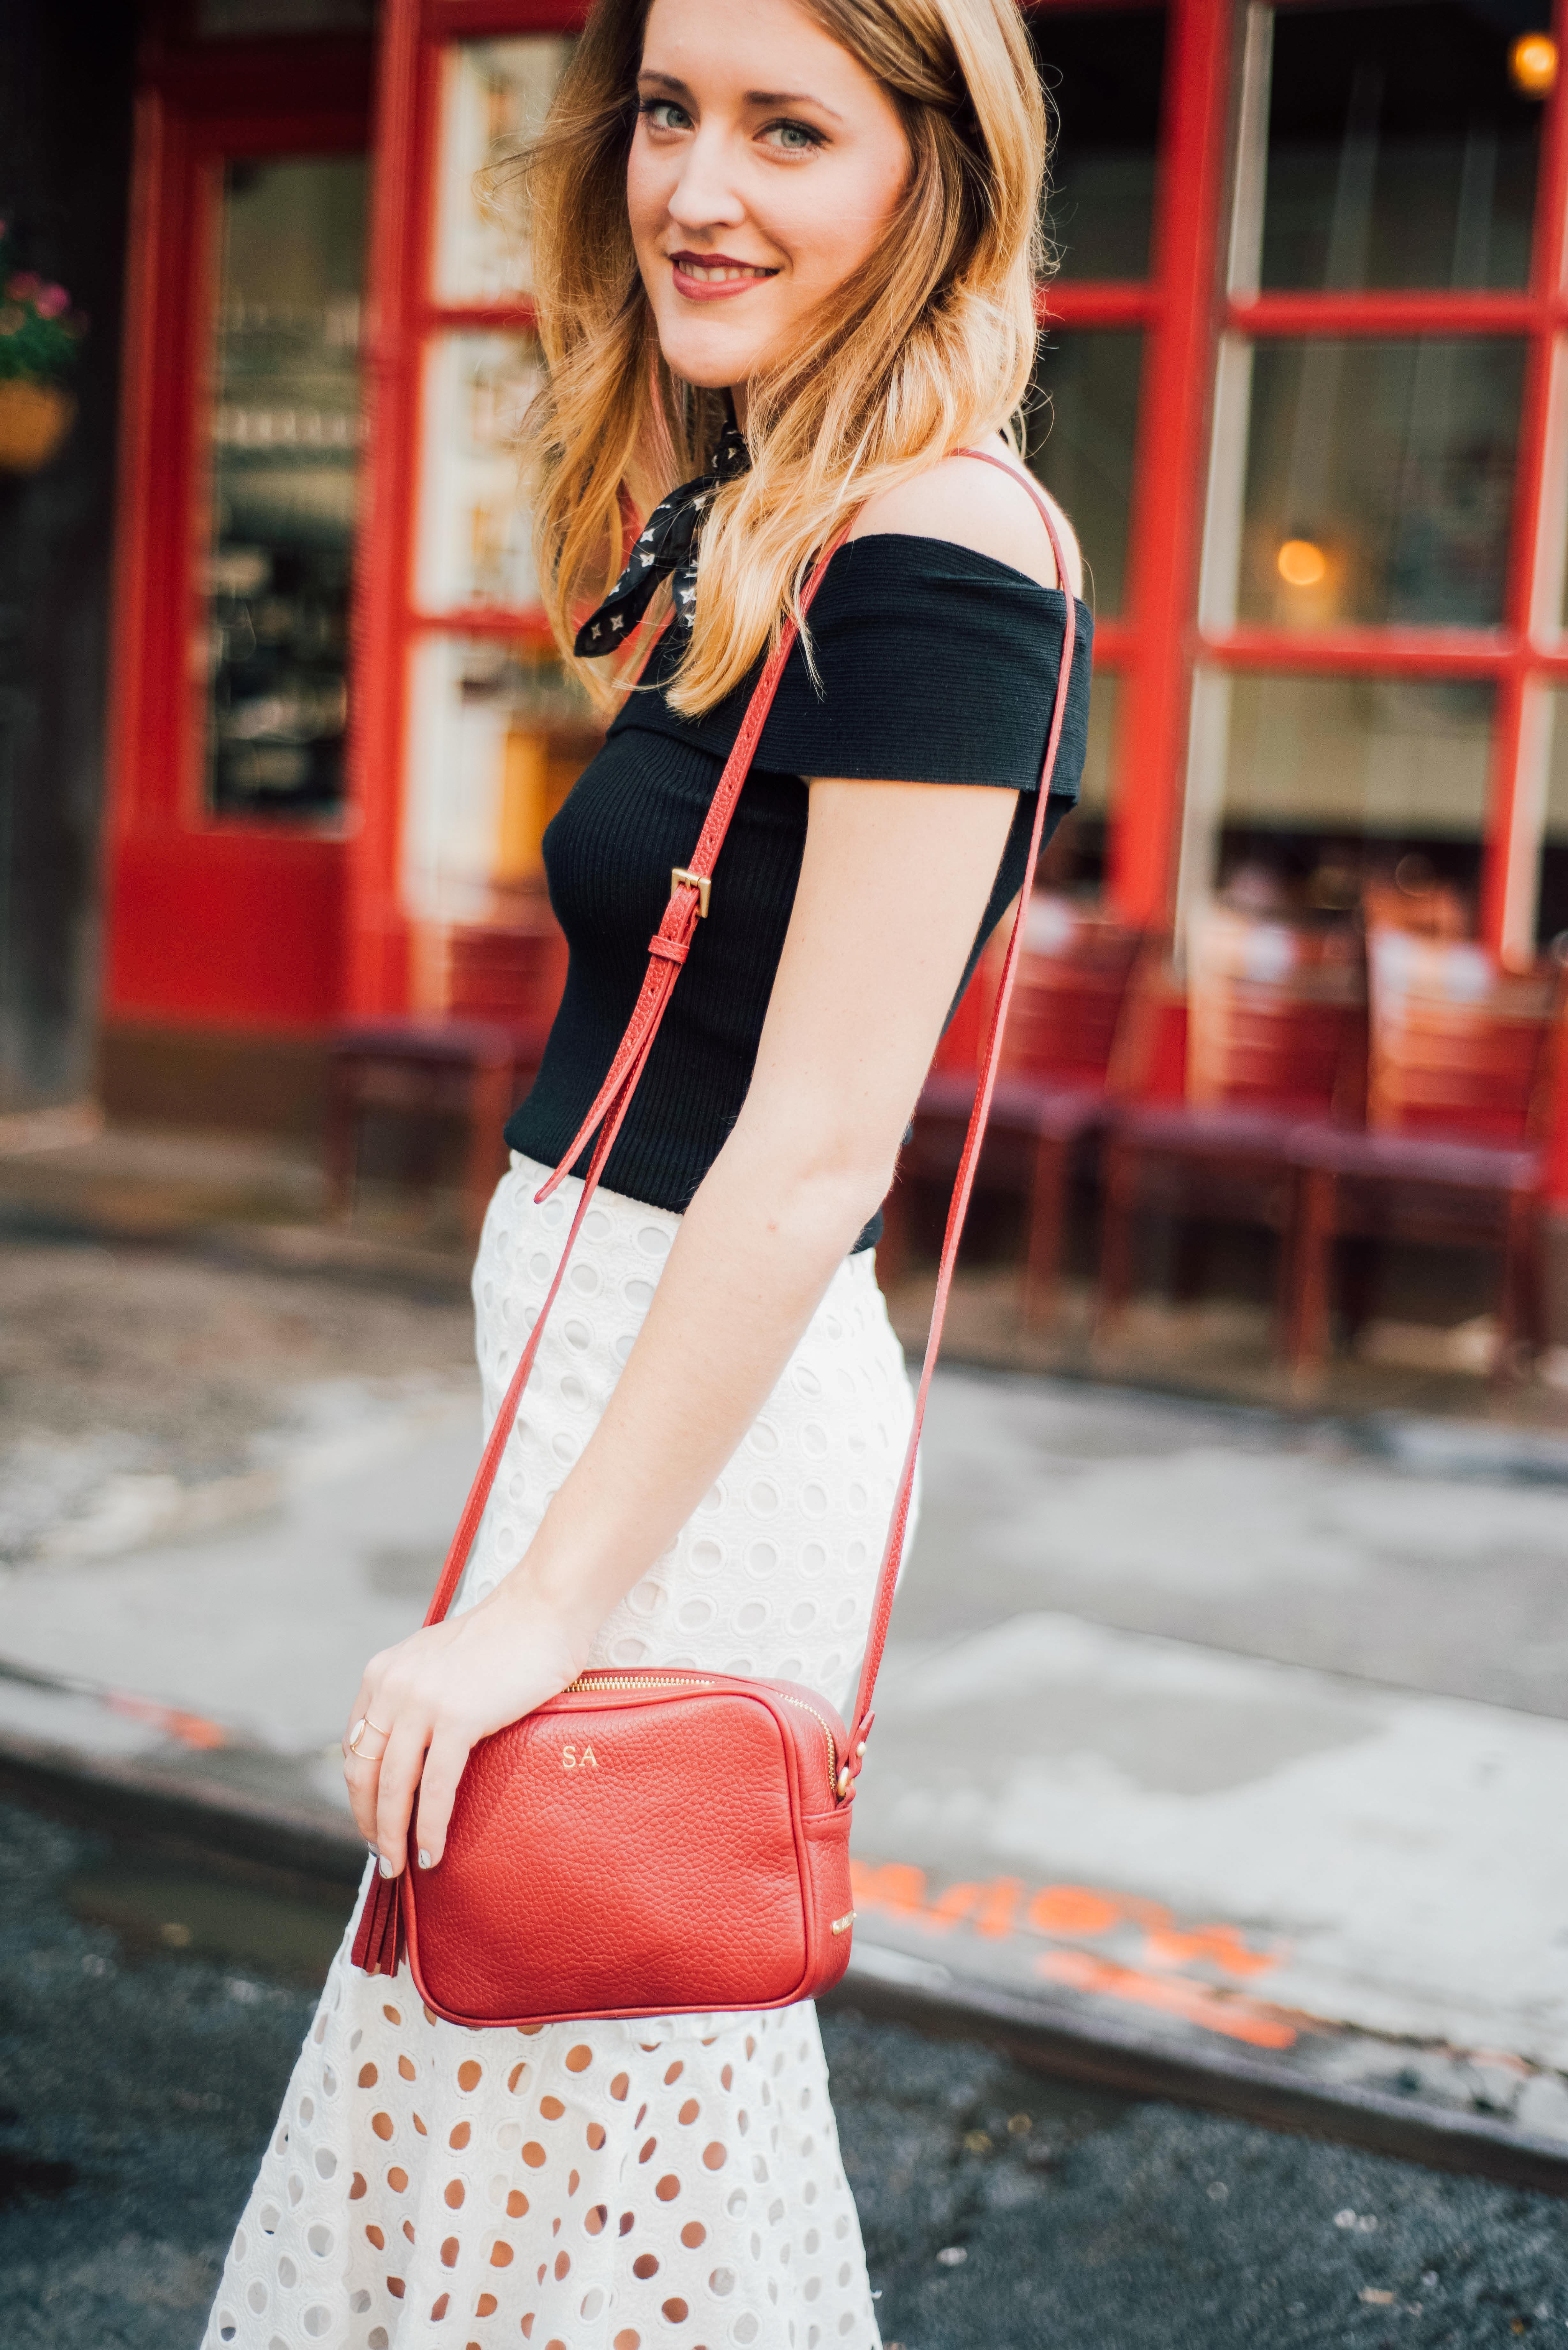 New York Fashion week street style: black off the shoulder top + white skirt + fringe heels